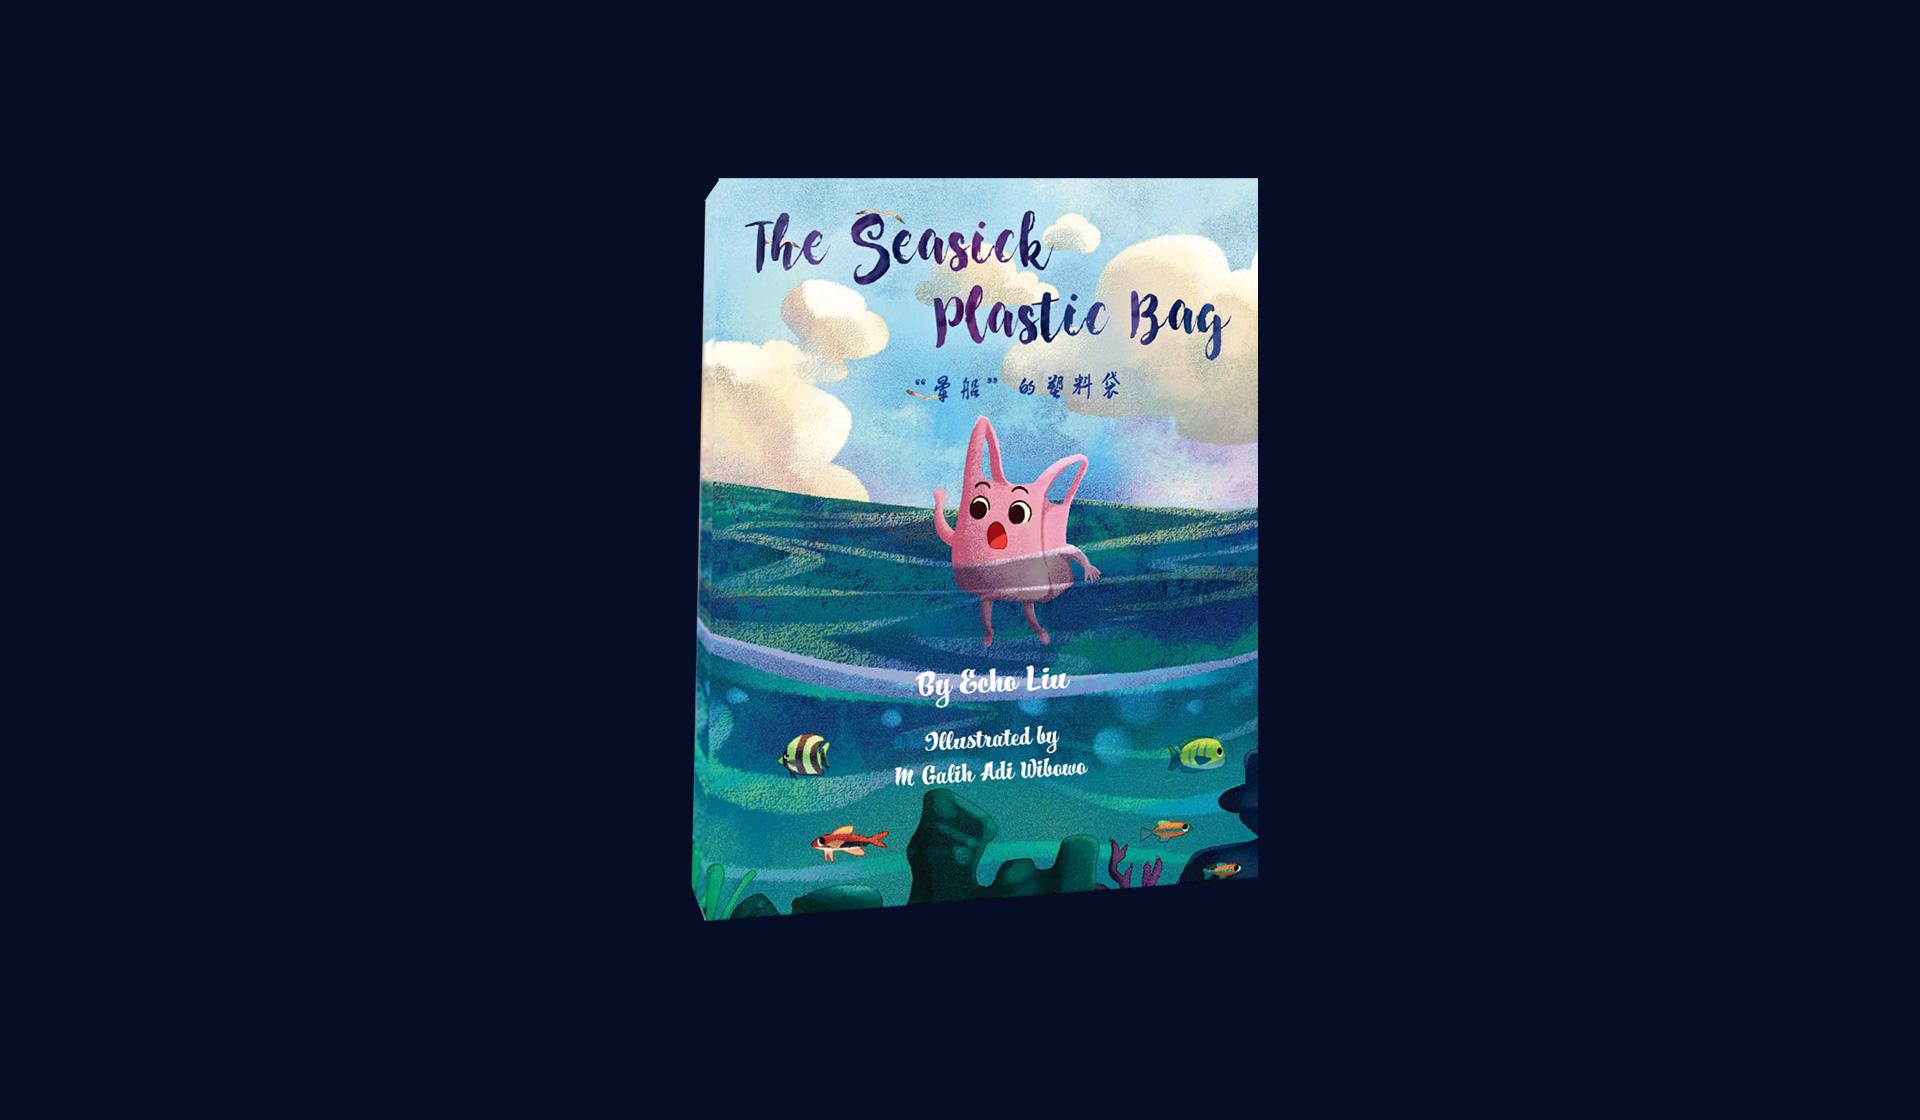 The seasick plastic bag